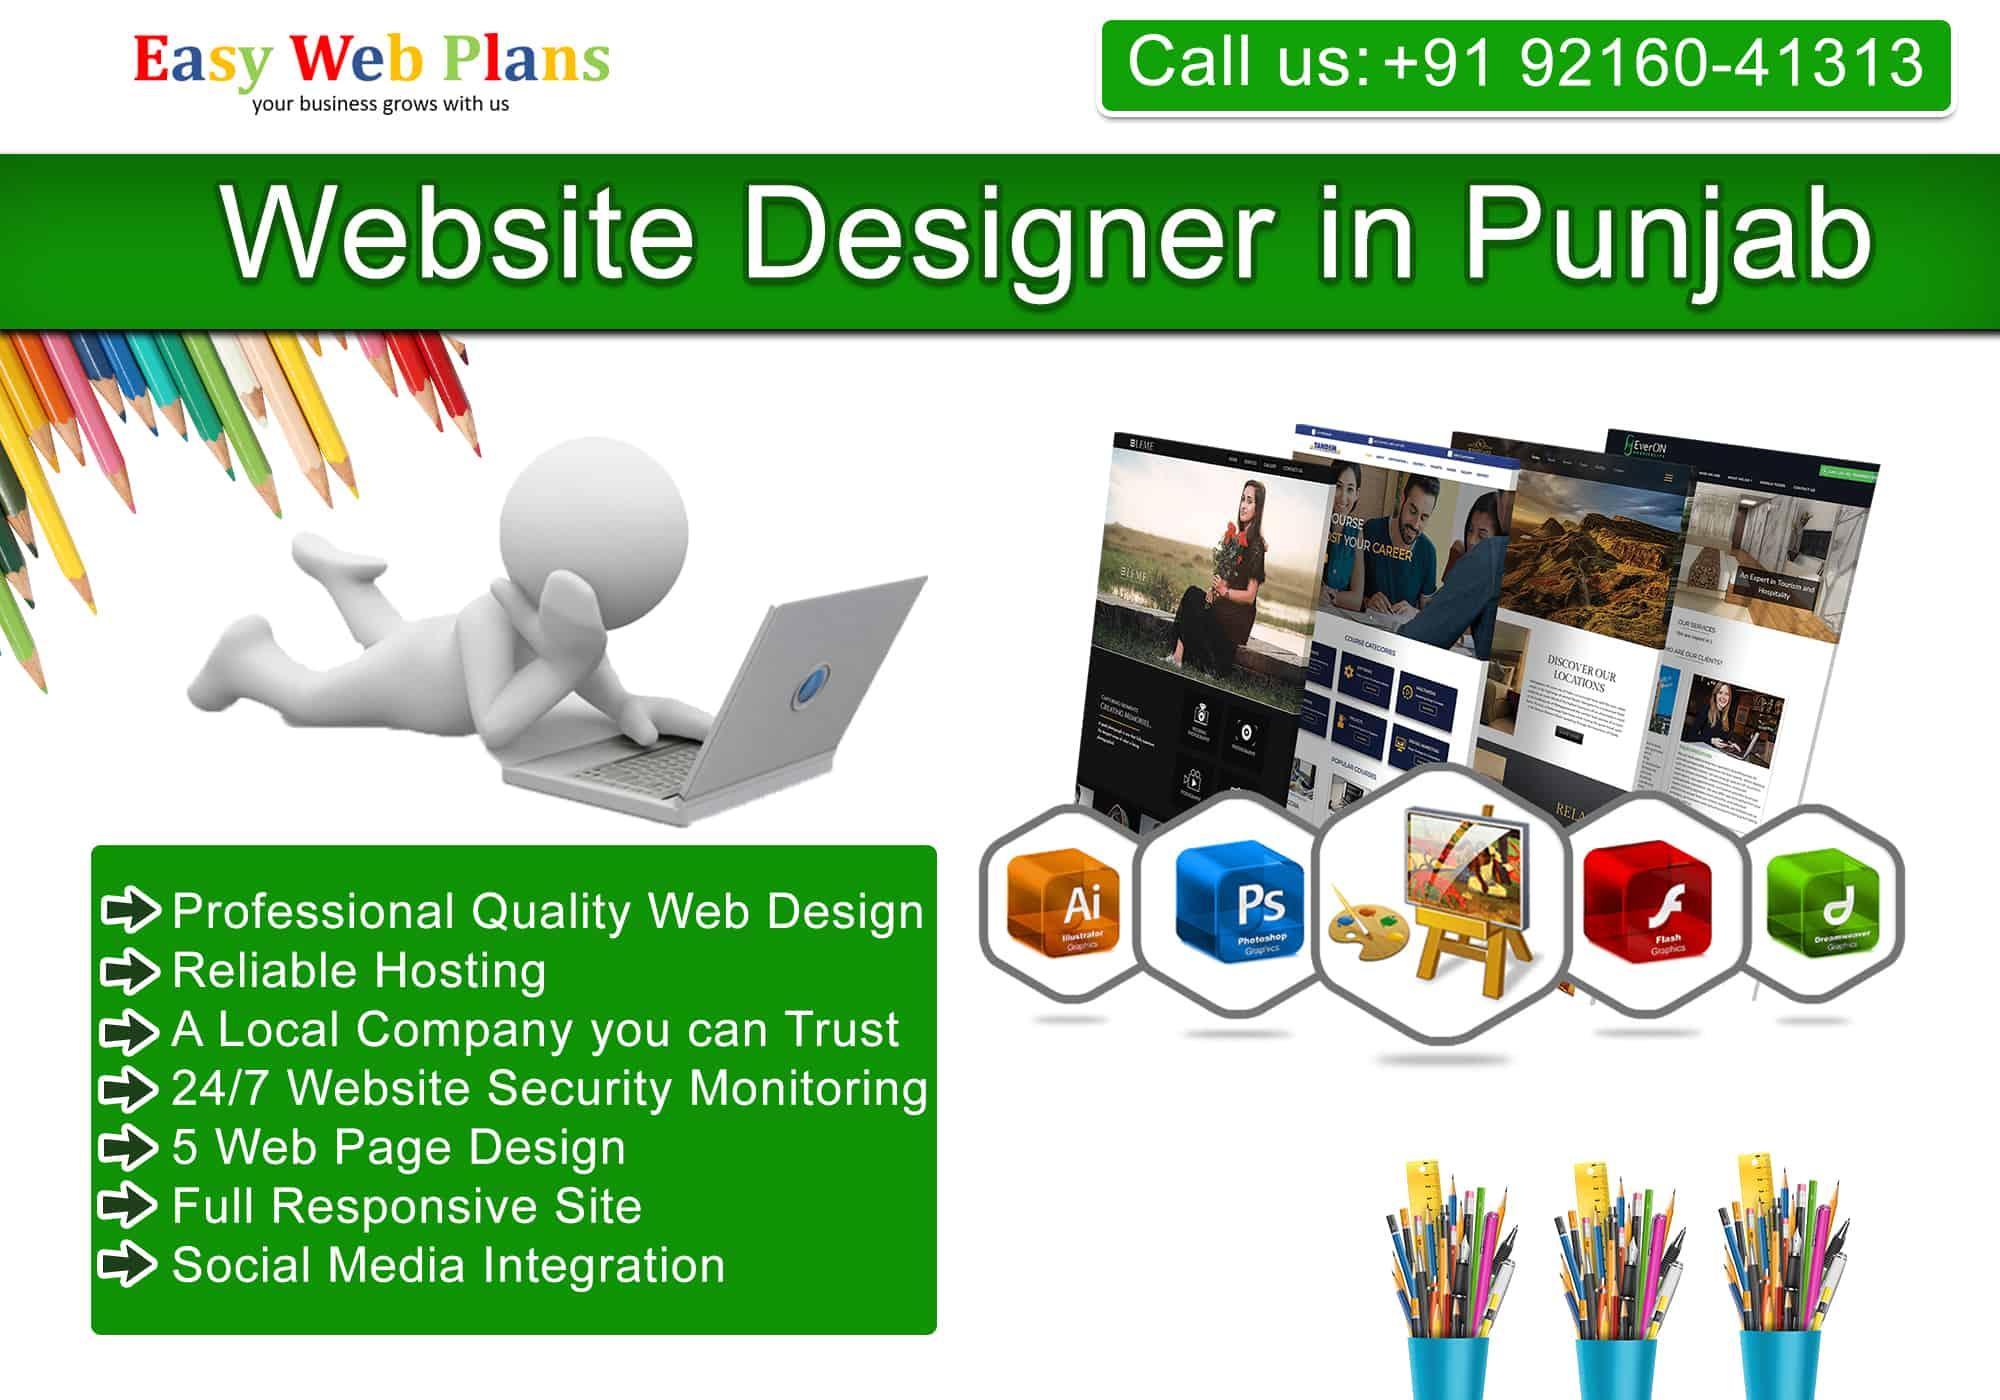 Website Designer in Punjab